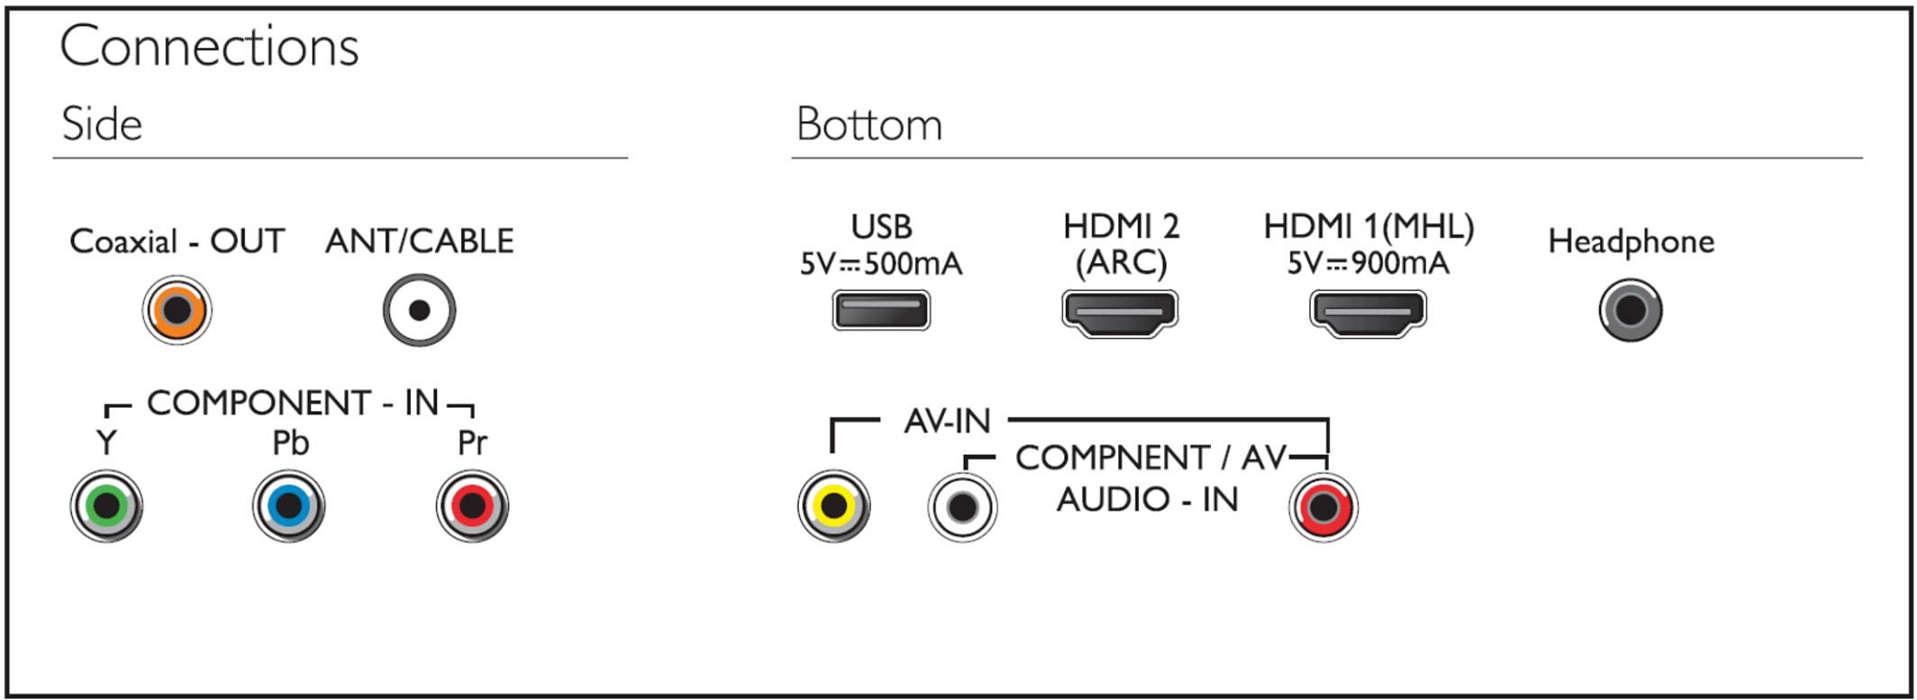 FHD LED TV 40PFT5583/67 | Philips